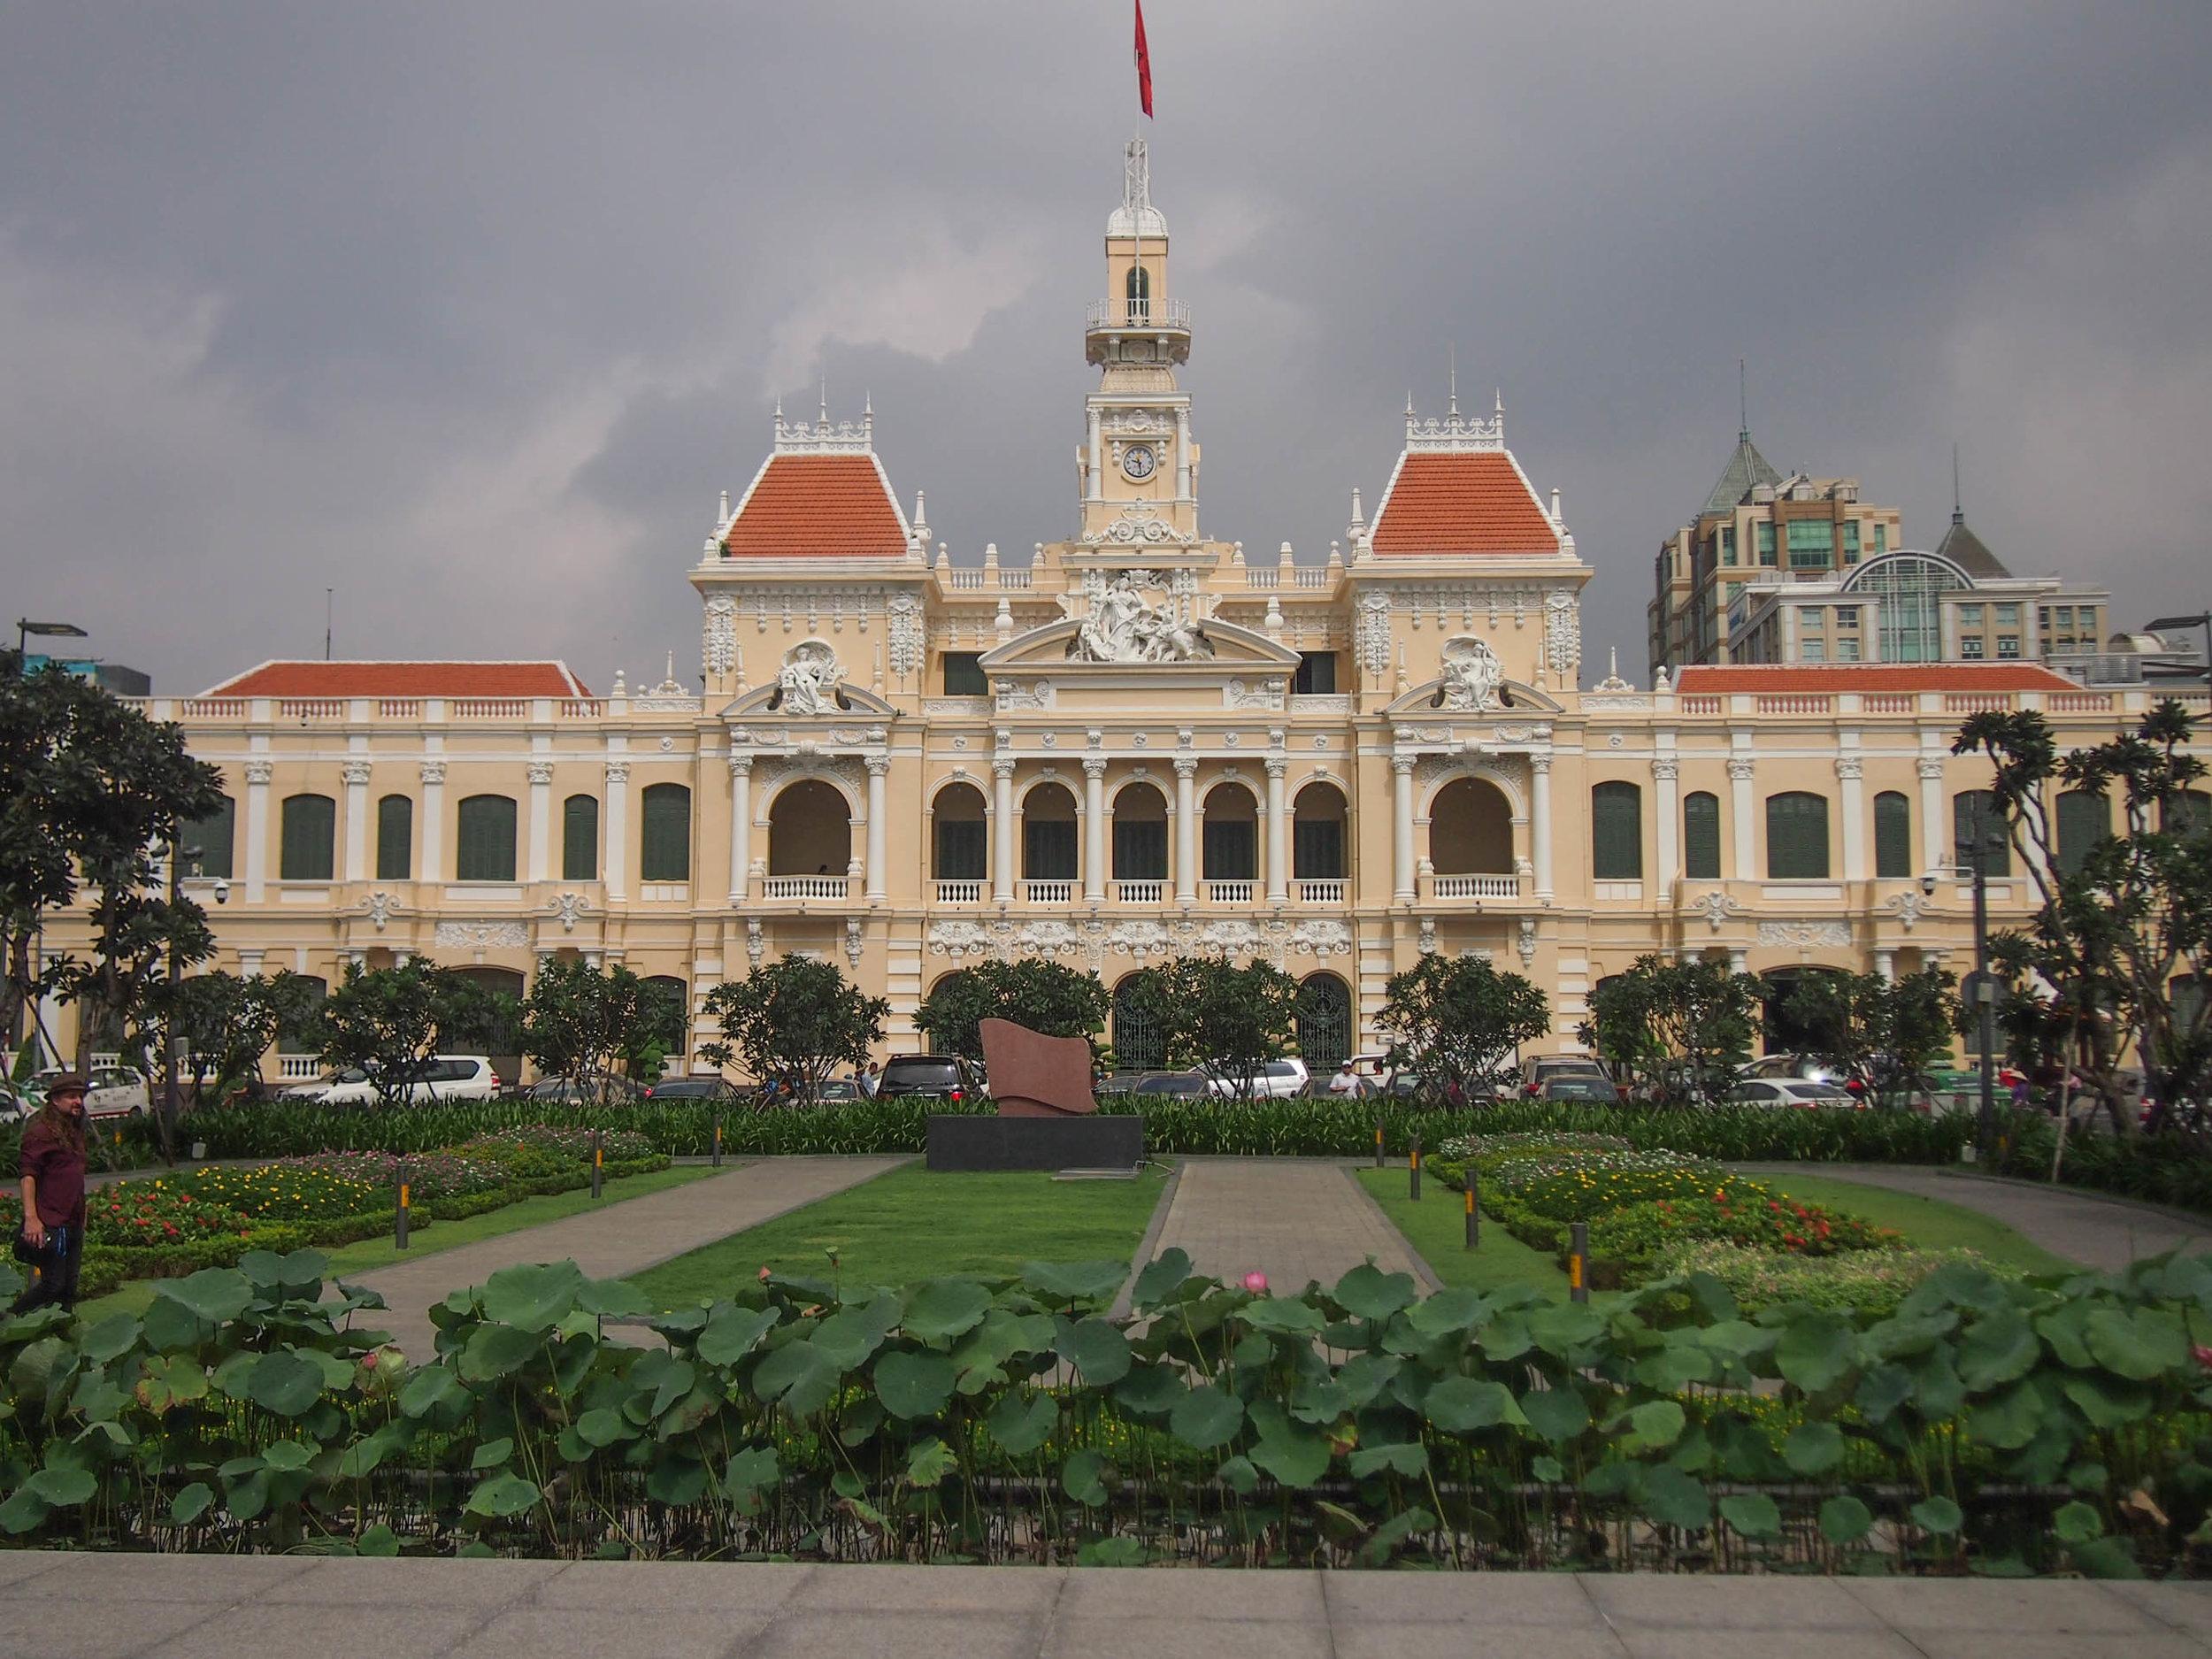 City Hall in Saigon Vietnam